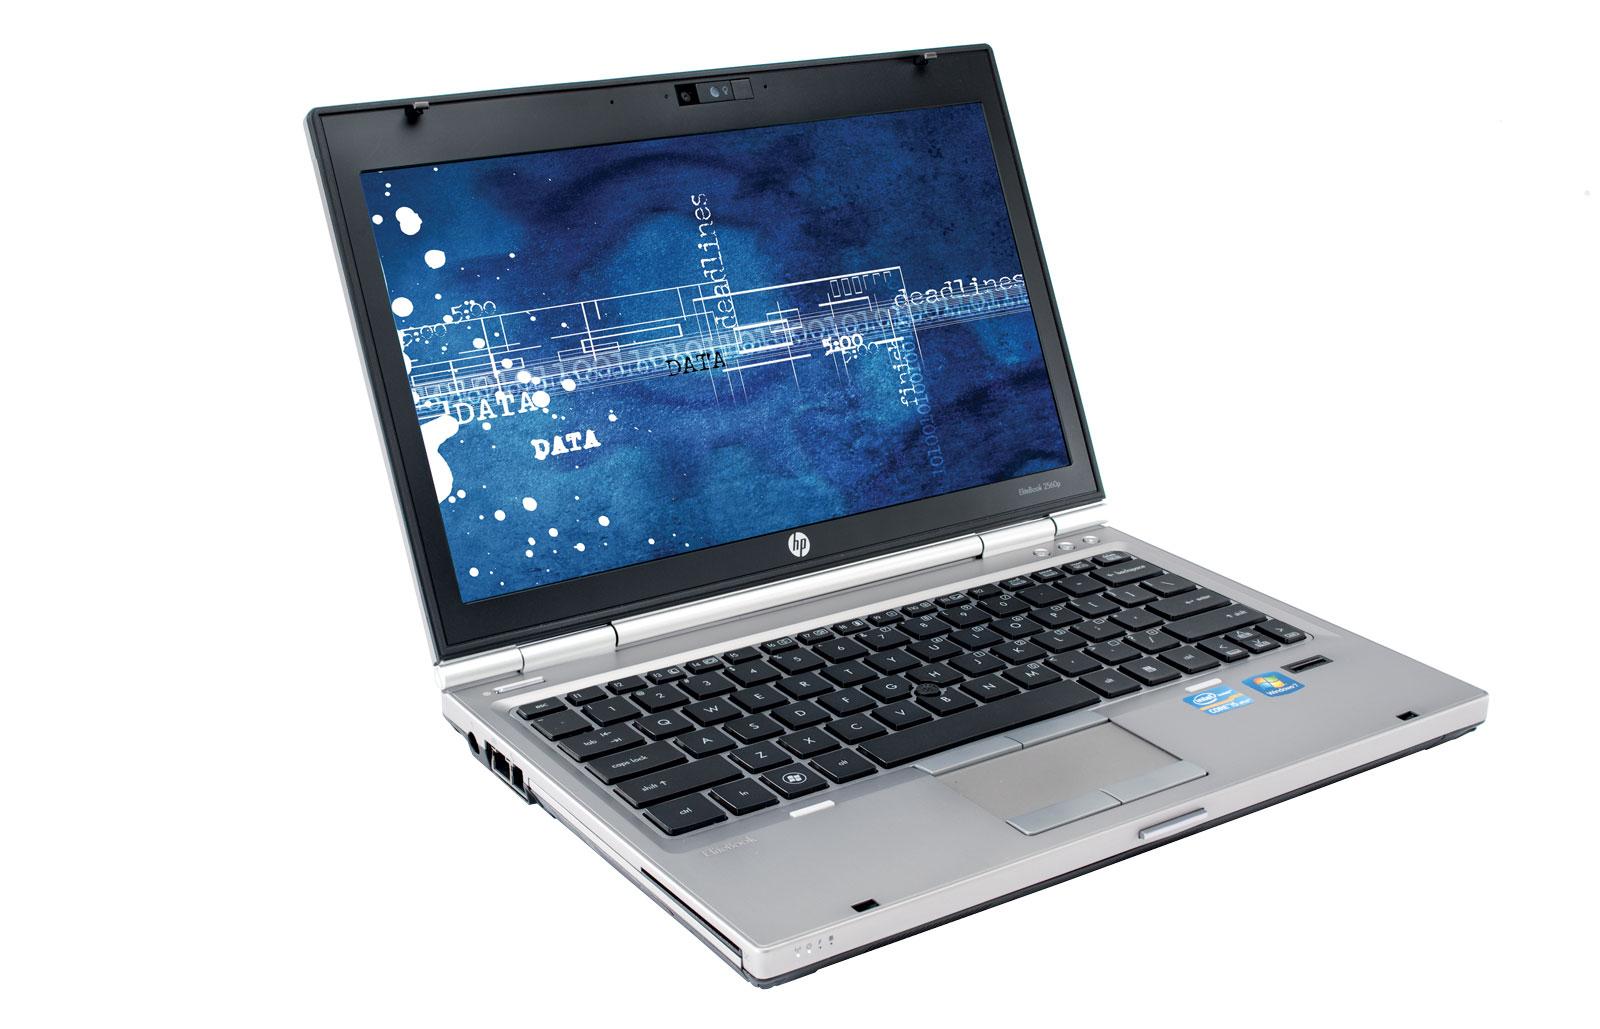 laptop cũ giá 2 triệu